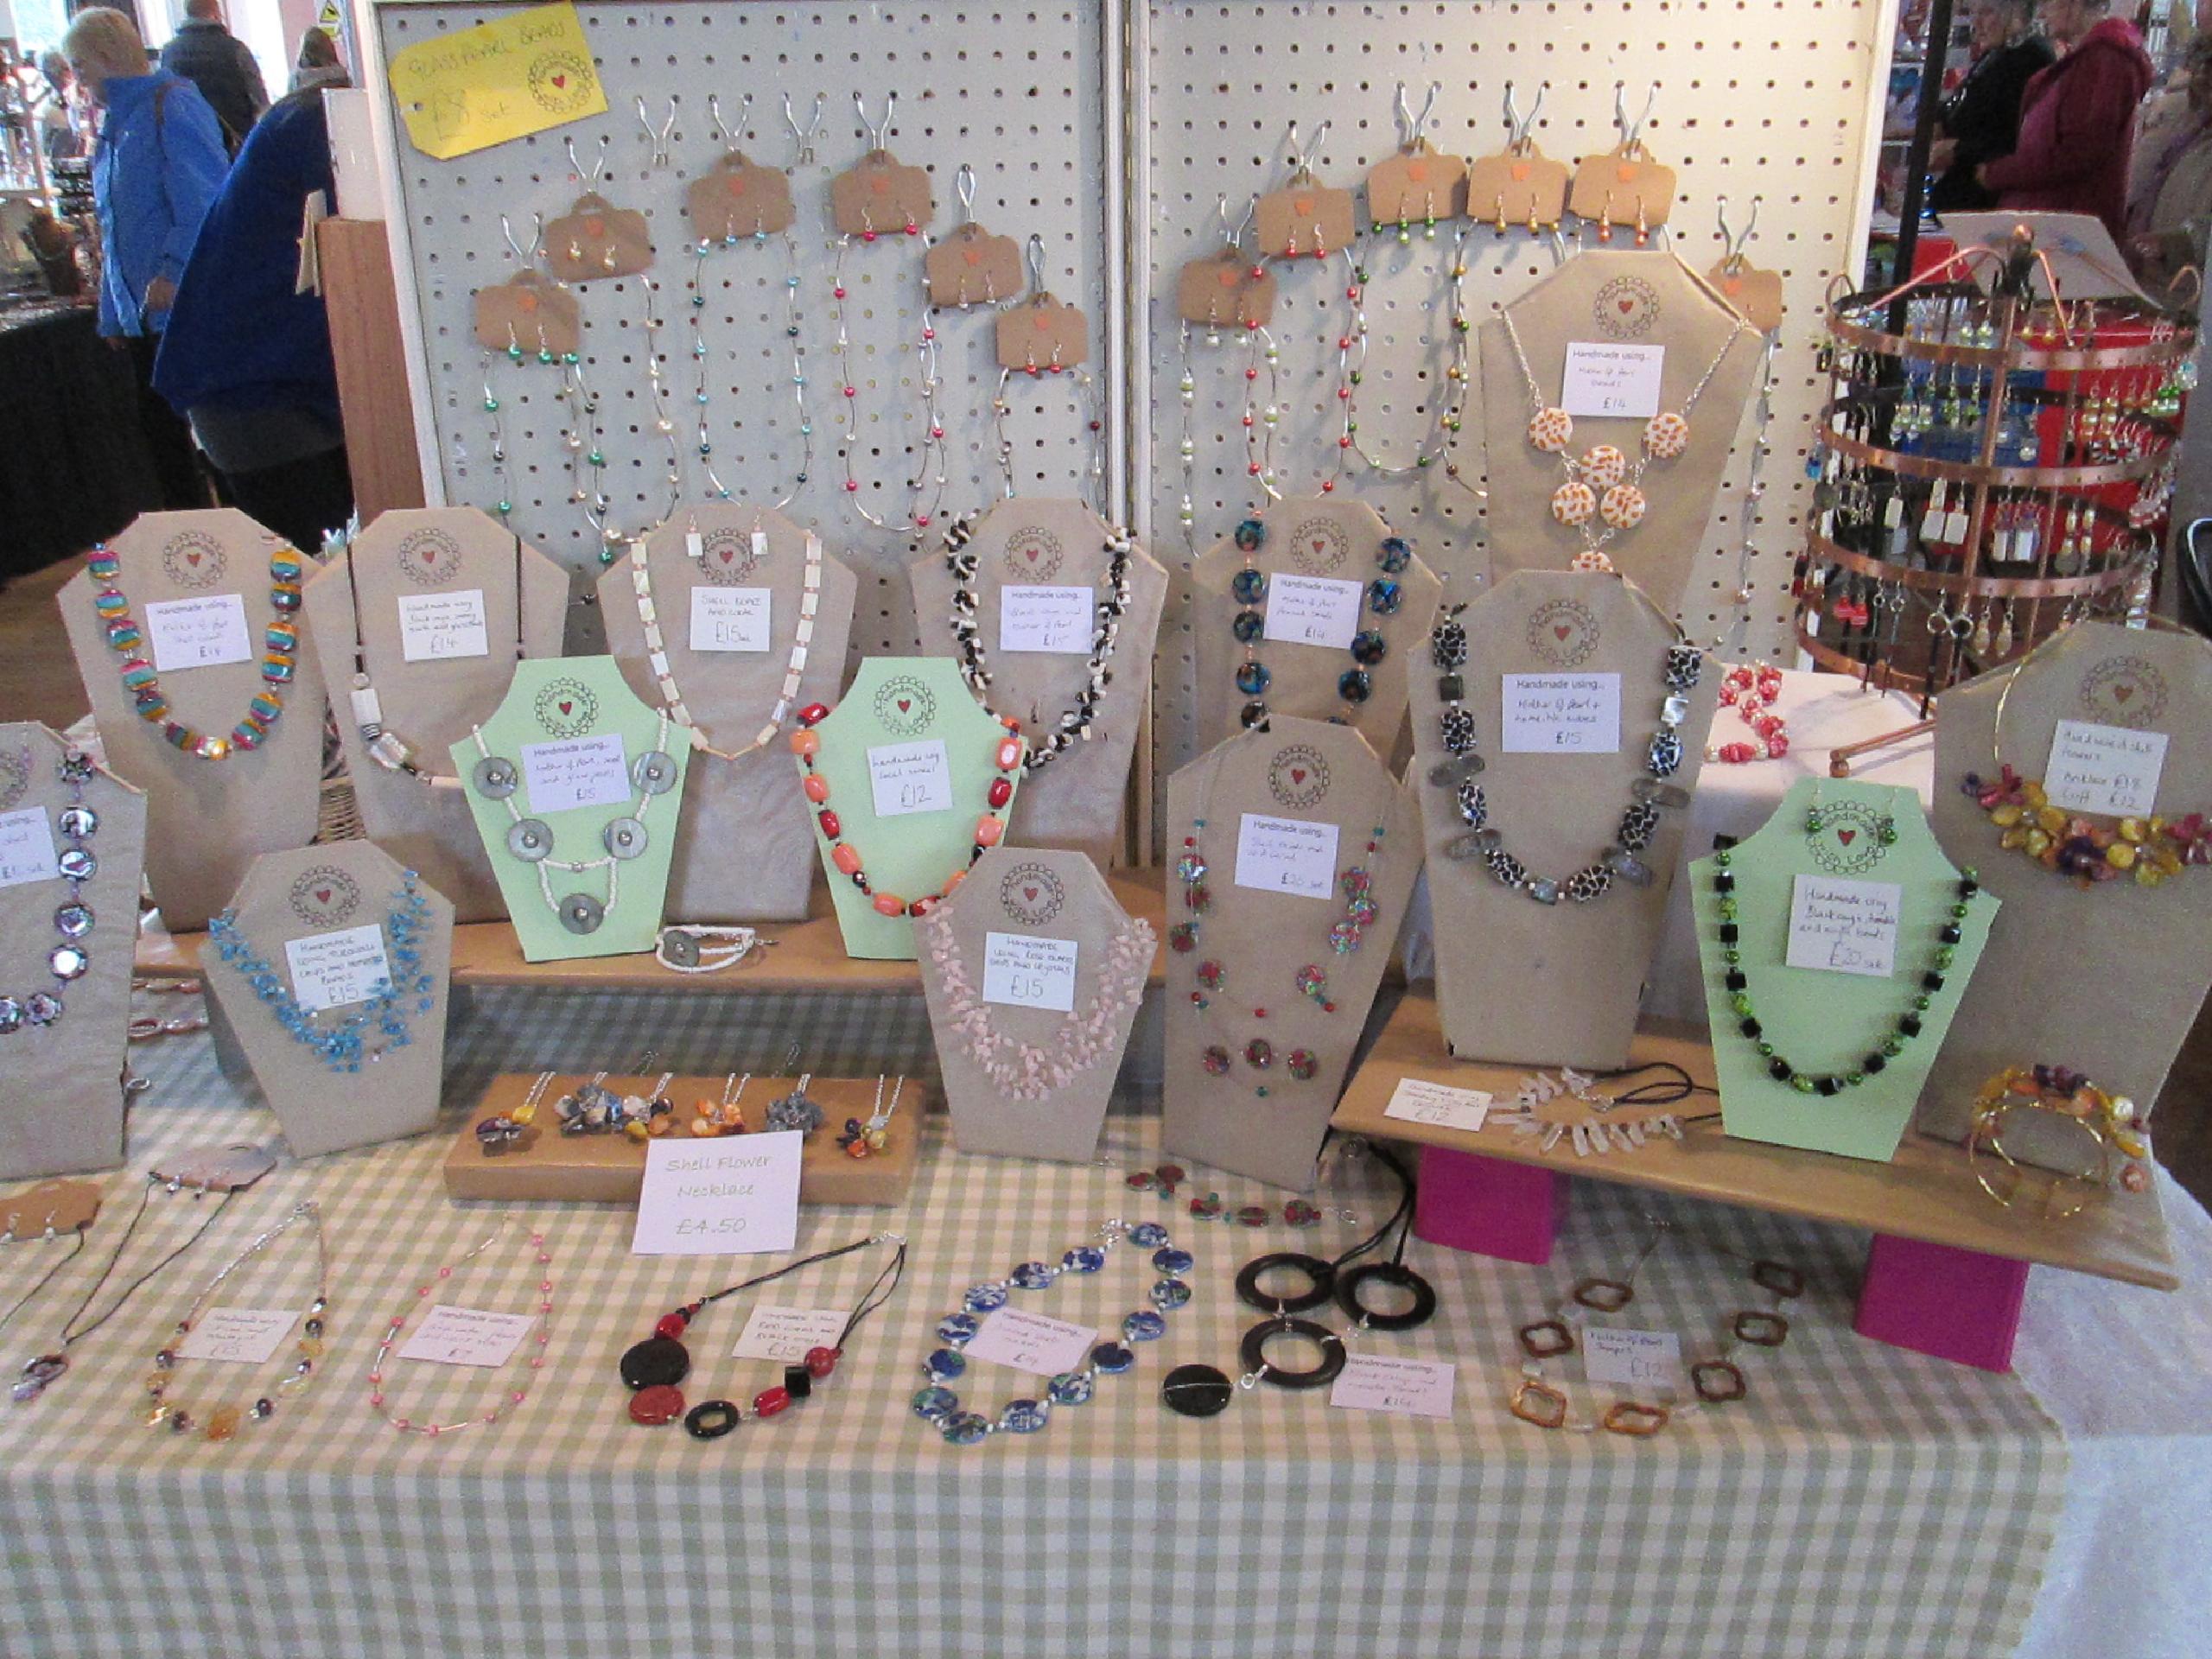 Indoor Stall 5 Jewellery